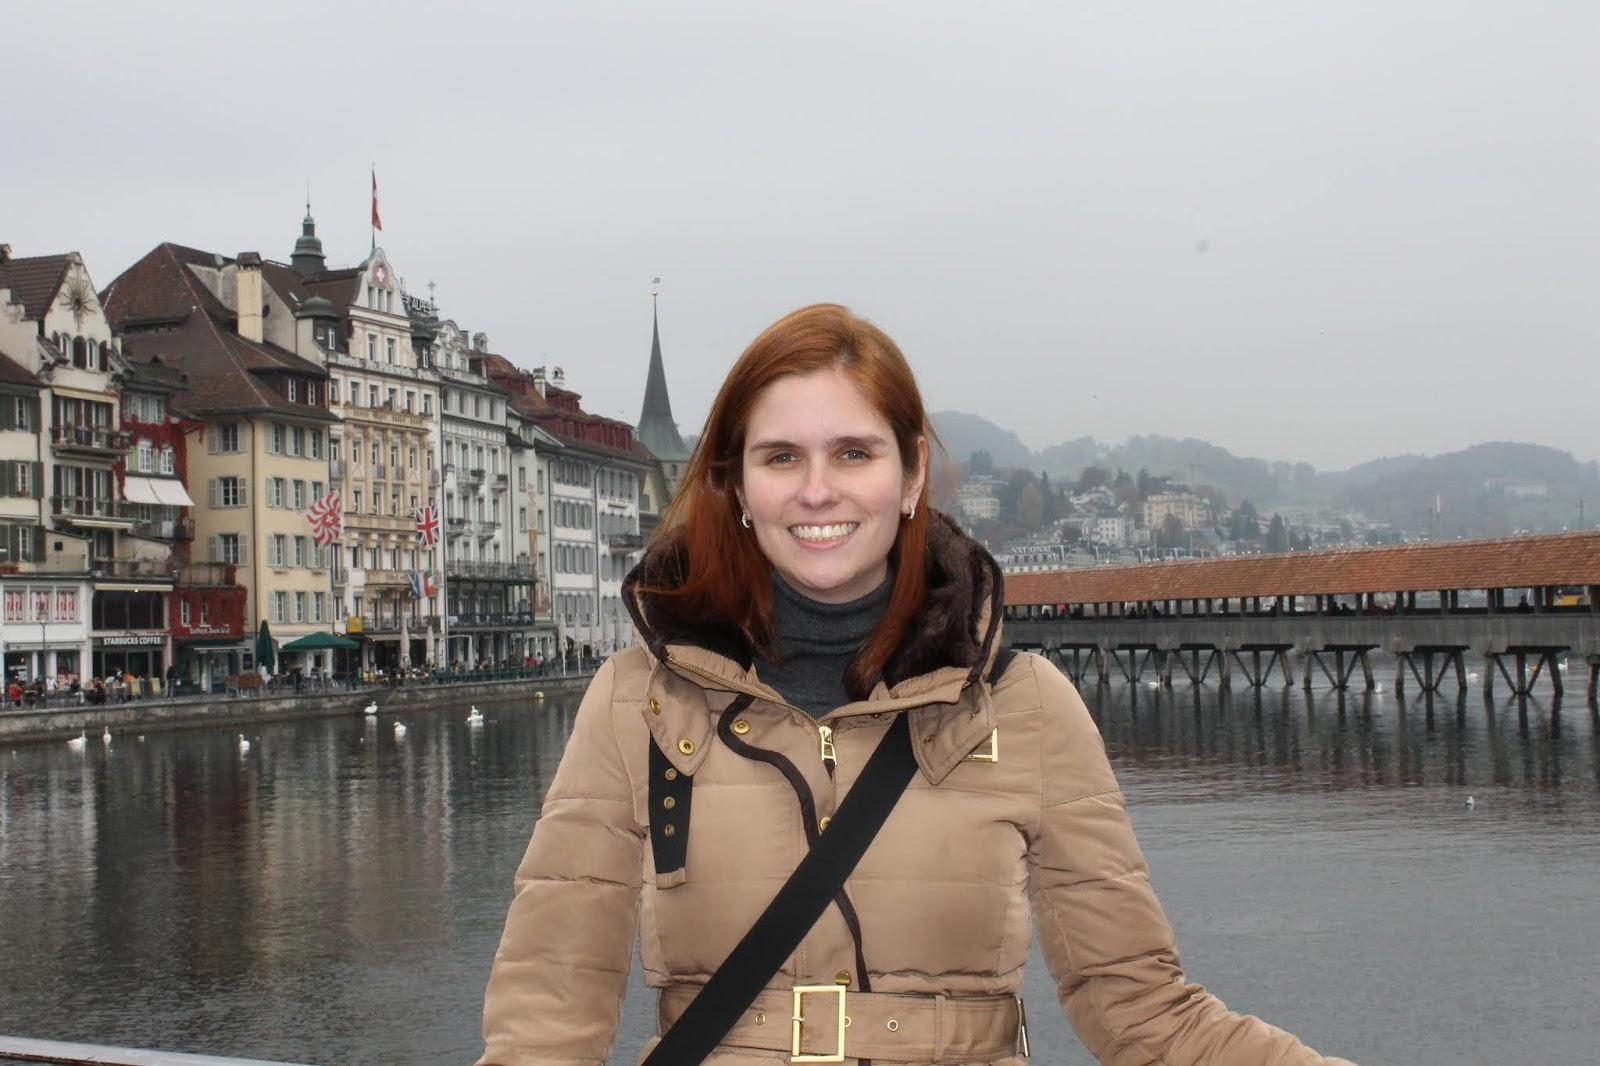 Altstadt ou Cidade Velha - Luzern